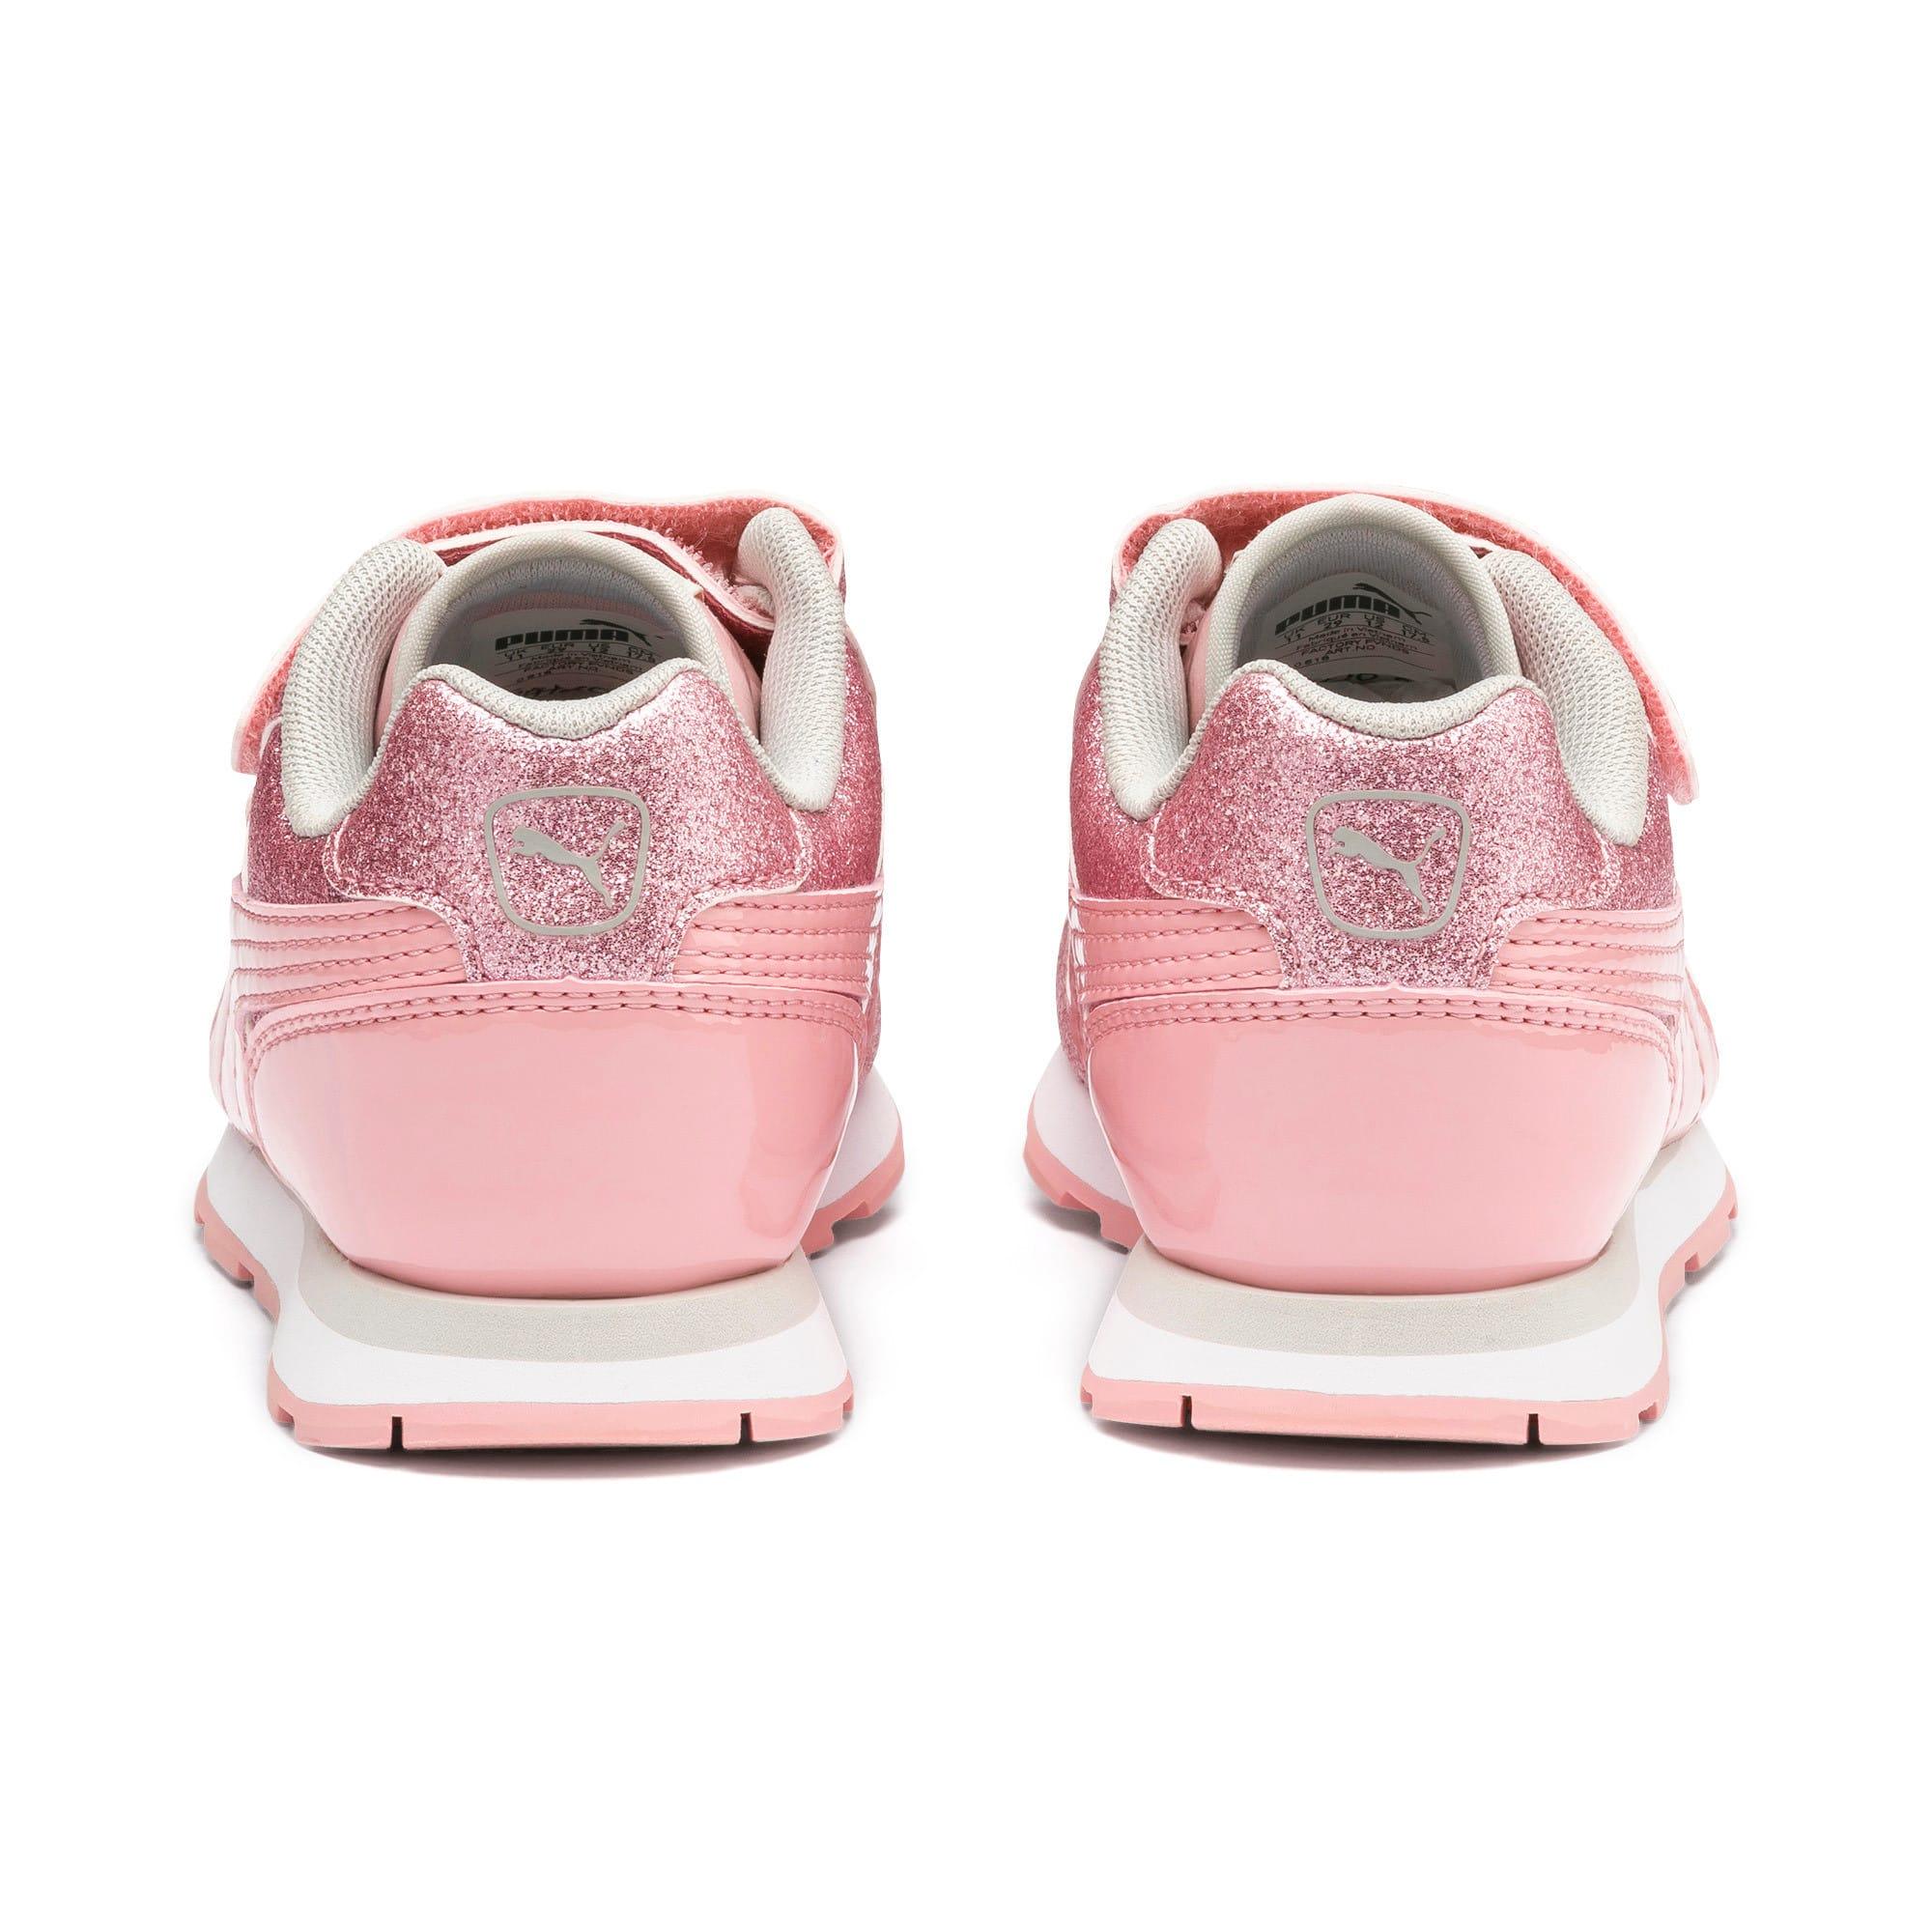 Miniatura 4 de Zapatos Vista Glitz para niña pequeña, Bridal Rose-Gray Violet, mediano